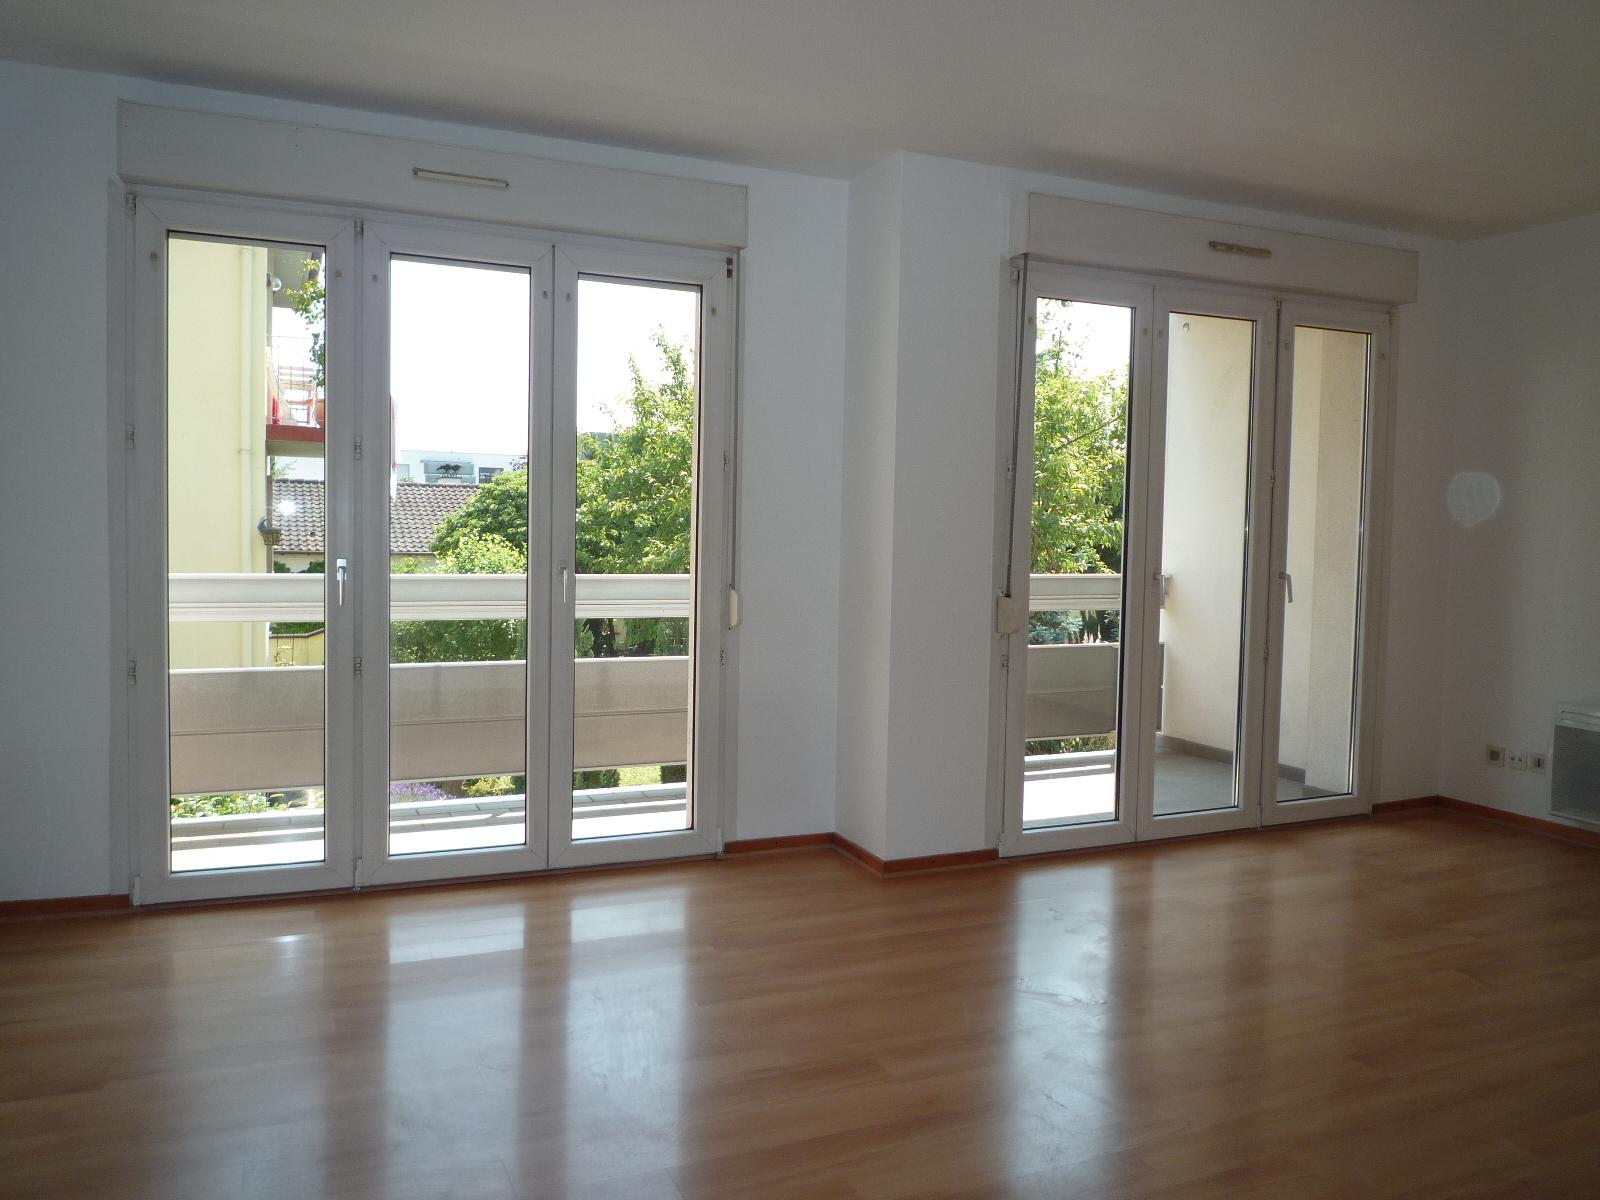 [Soleil] Beau 3 pièces avec terrasse et garage - Illkirch - nos locations - Beausite Immobilier 1